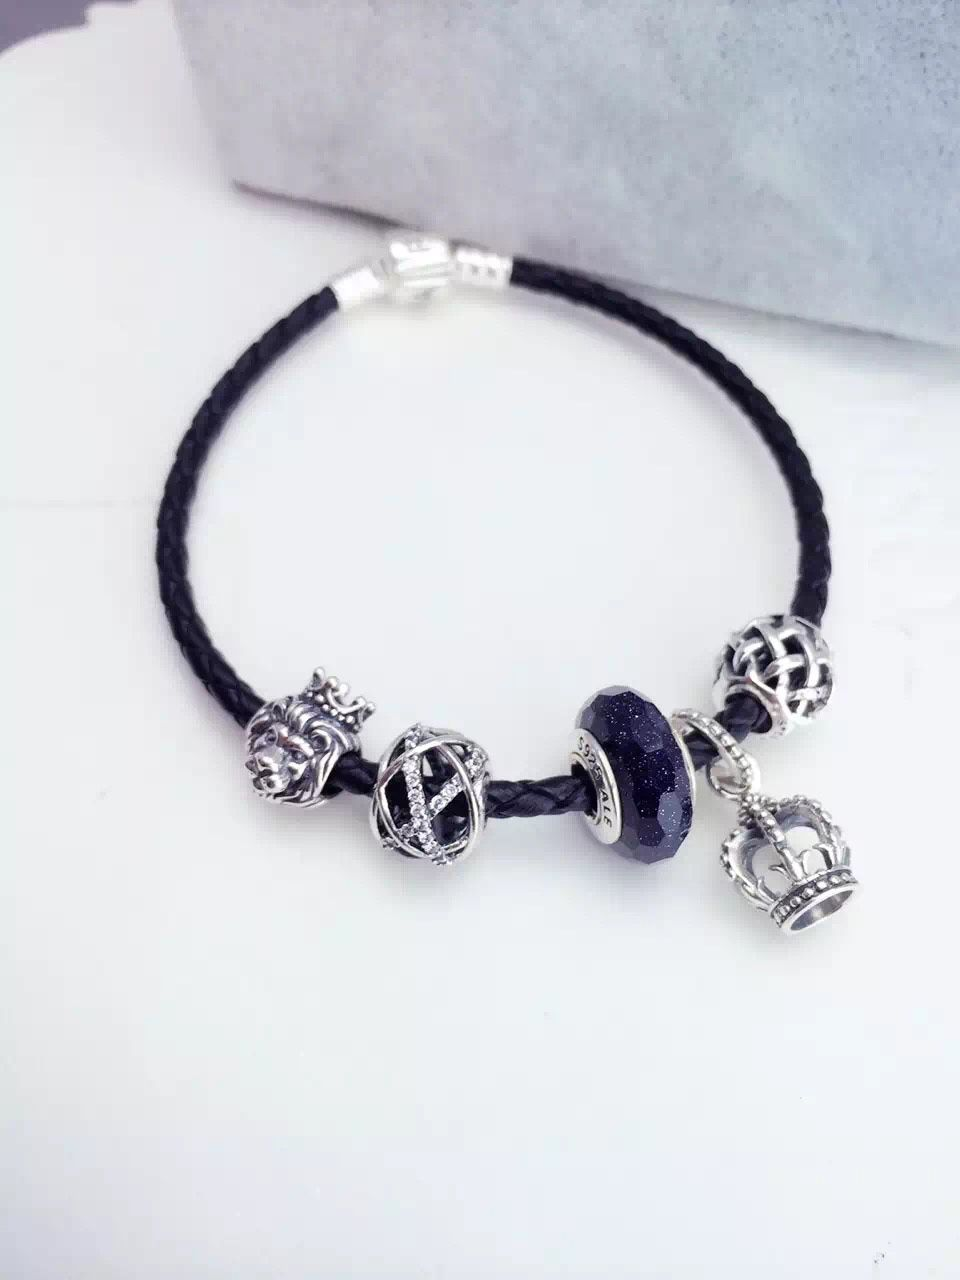 96240aff9 $159 Pandora Leather Charm Bracelet Black. Hot Sale!!! SKU: CB01690 - PANDORA  Bracelet Ideas